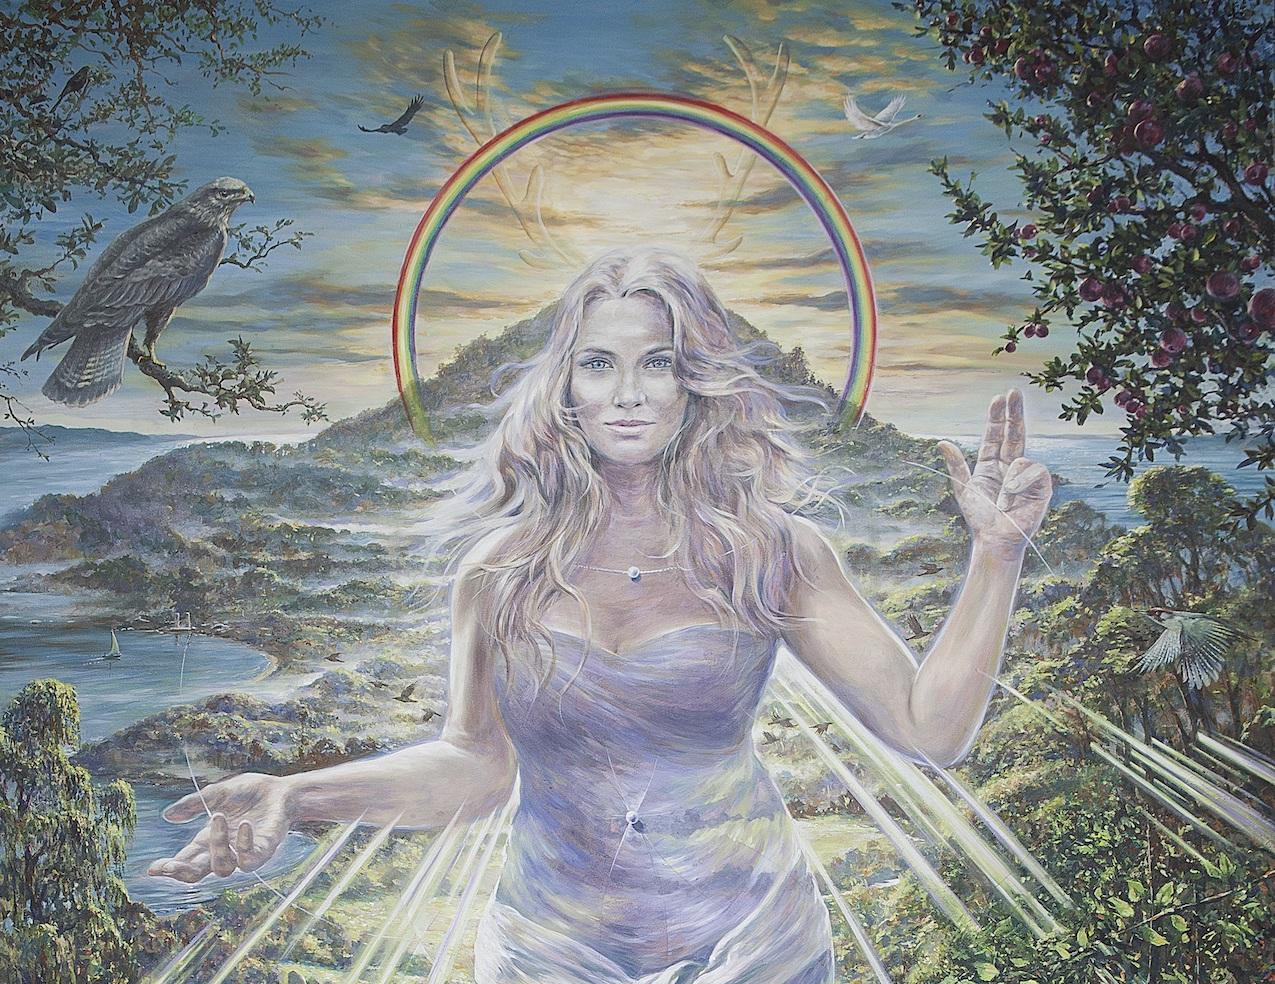 """Lady of Avalon"", by Jonathan Minshull"